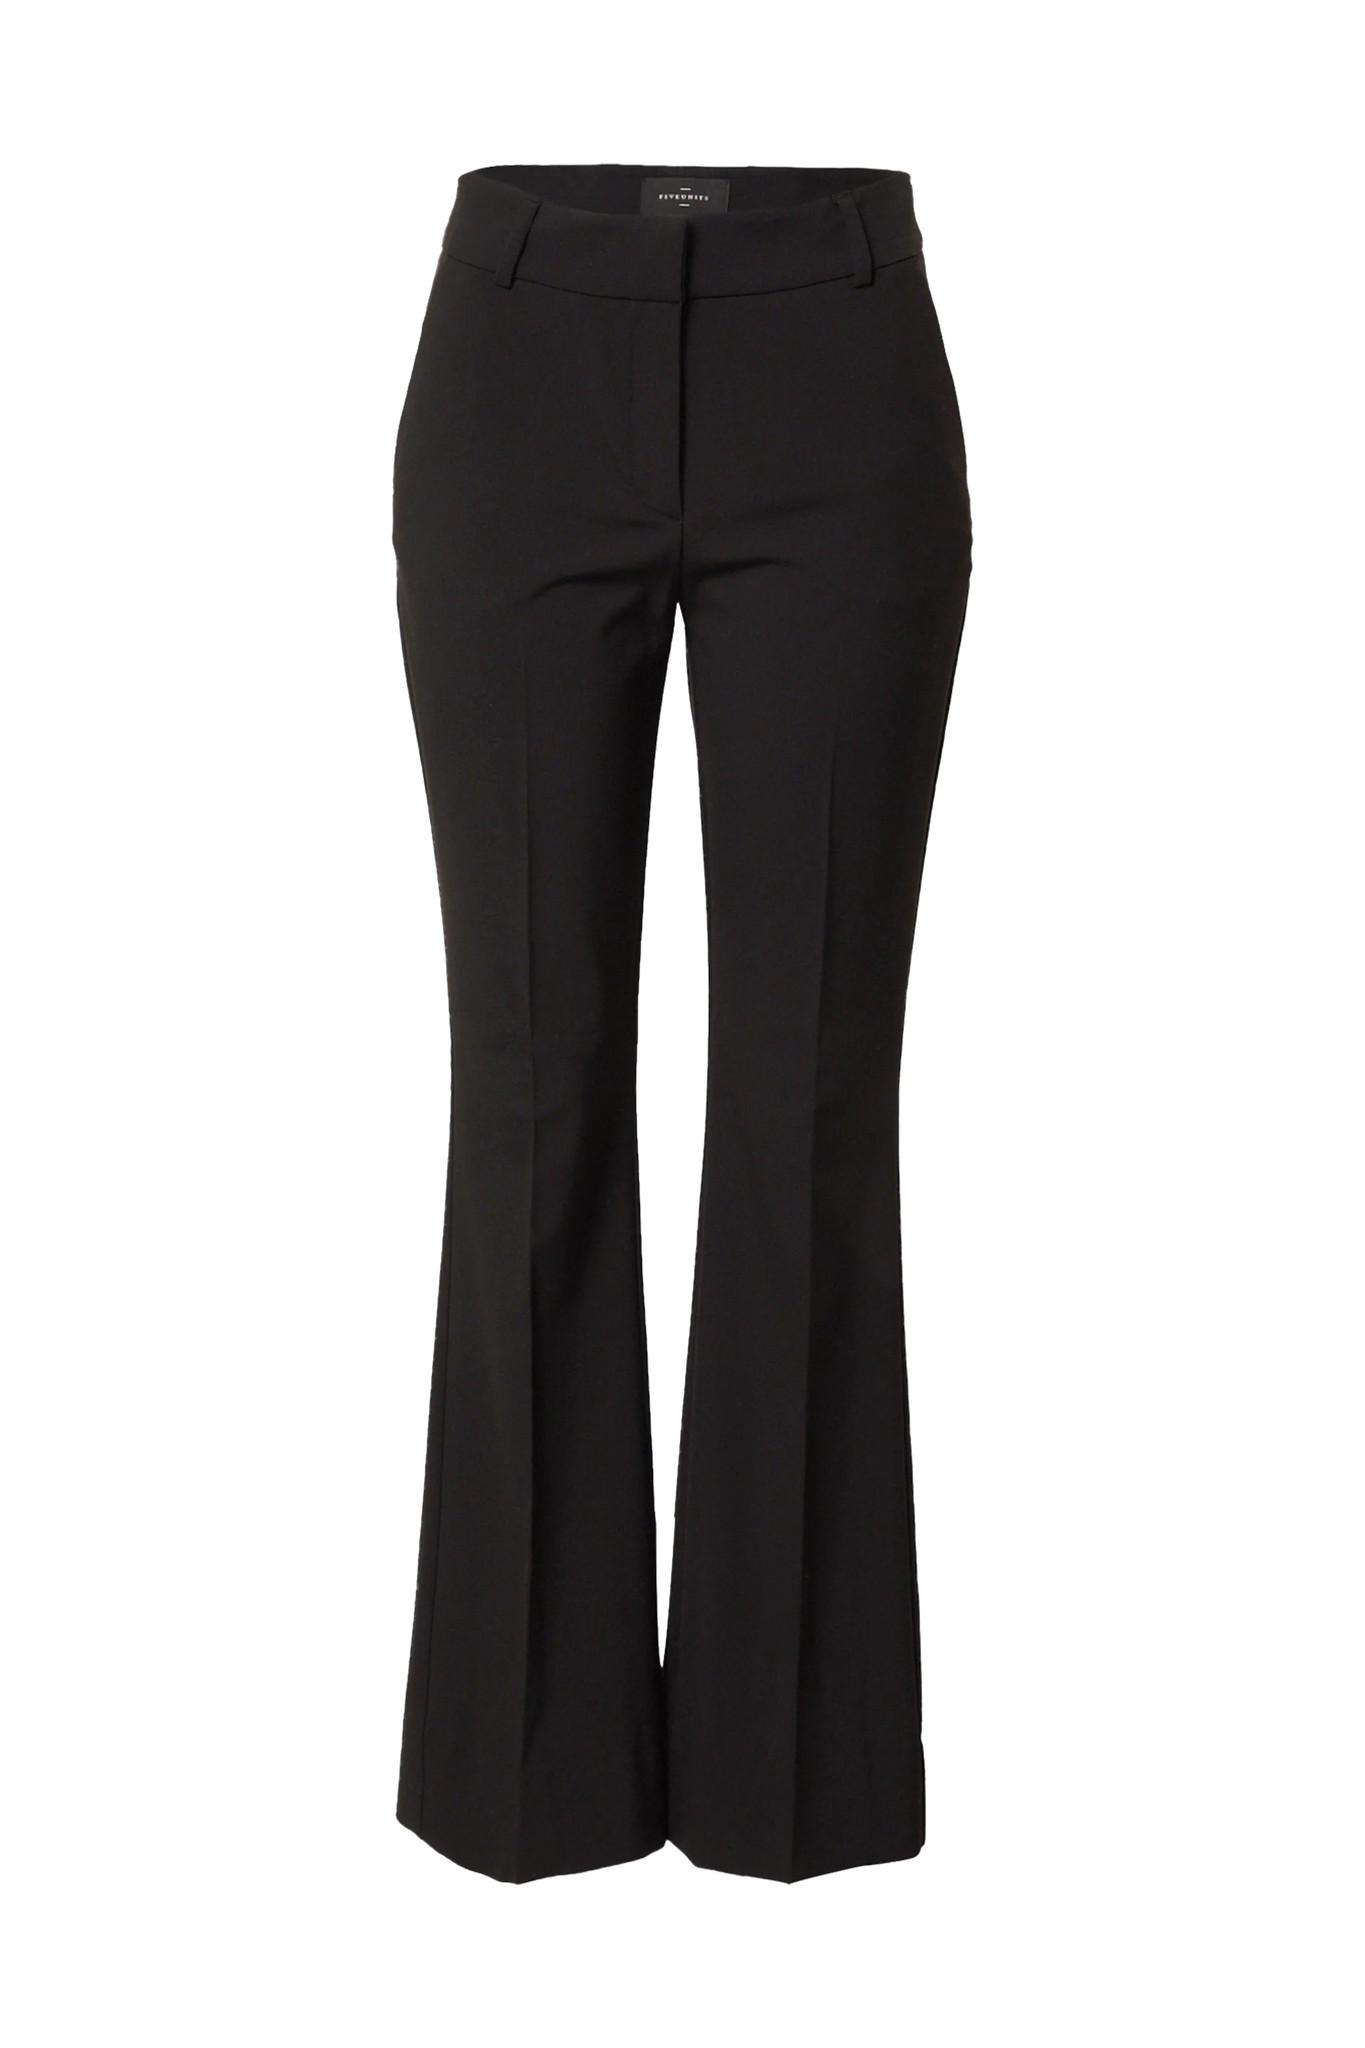 Clara 285 Long Pants - Black Glow-1